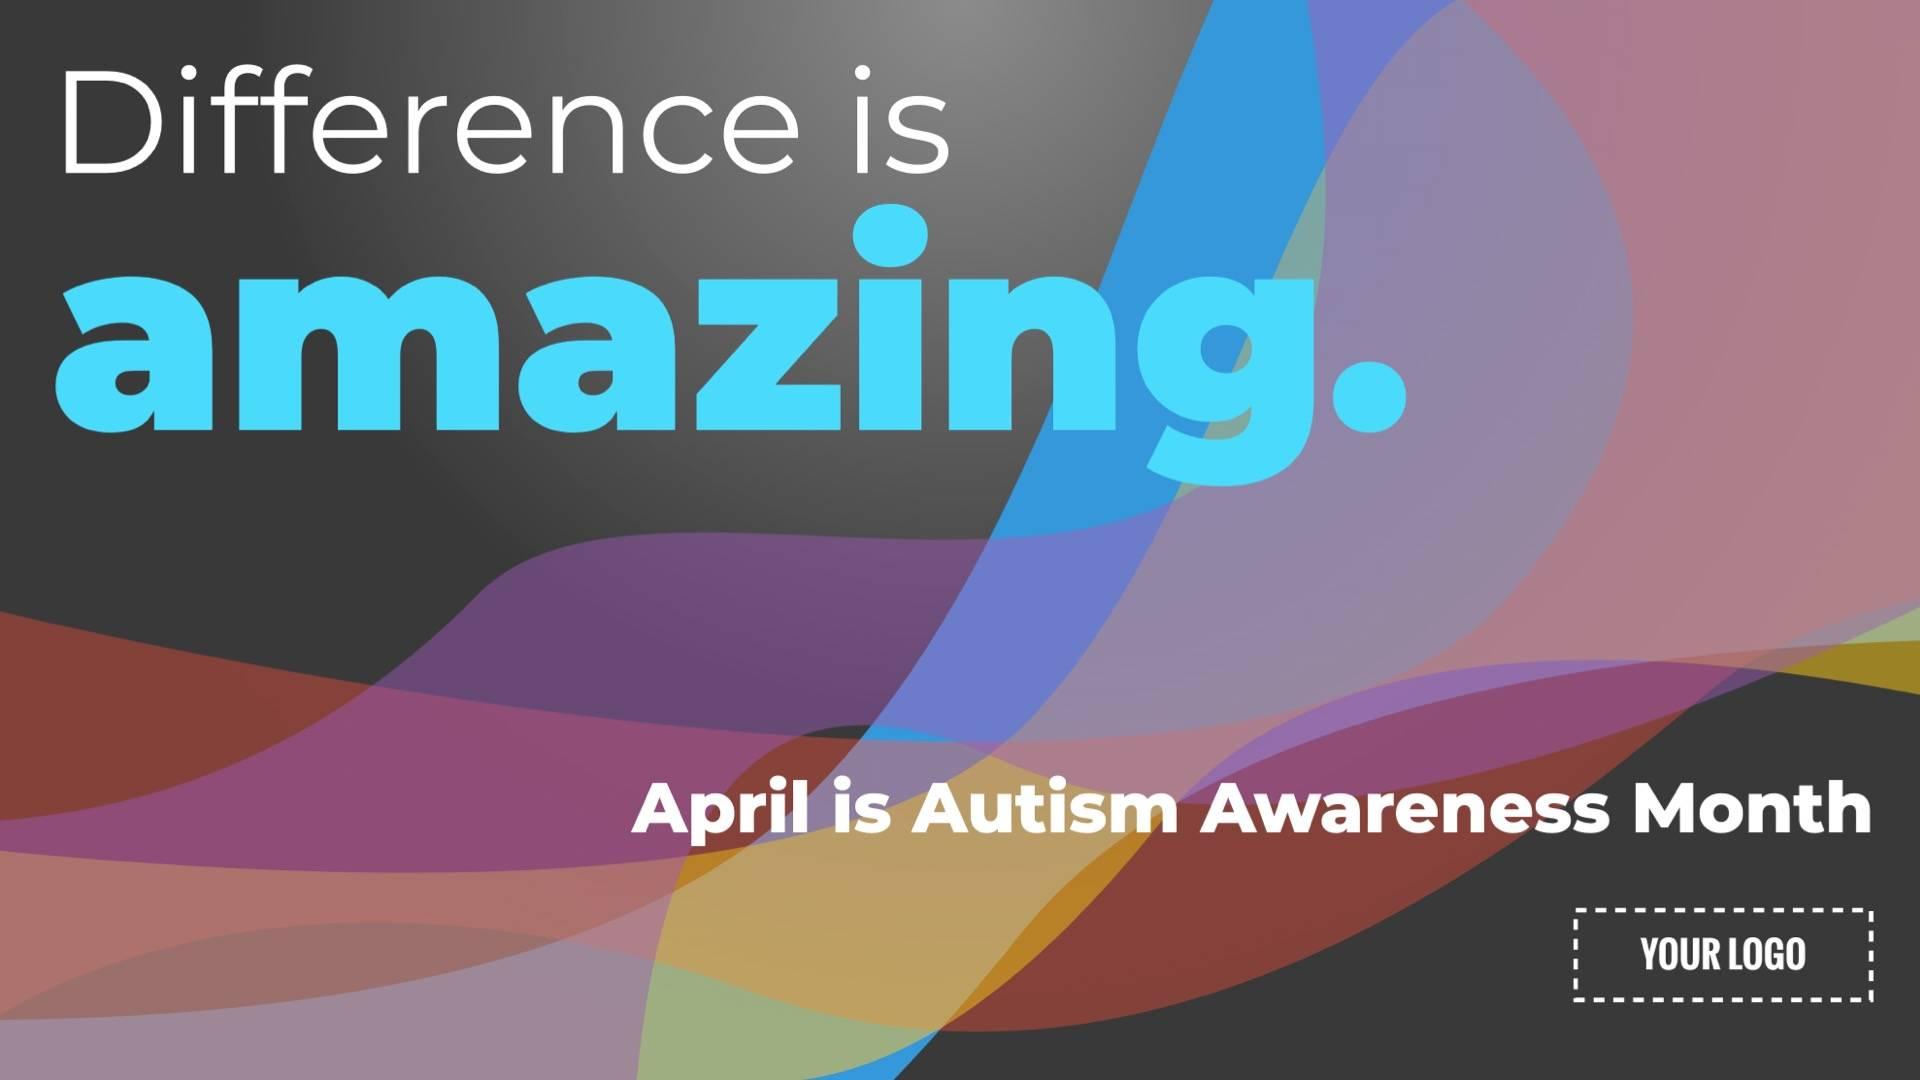 Autism Awareness Month Digital Signage Template